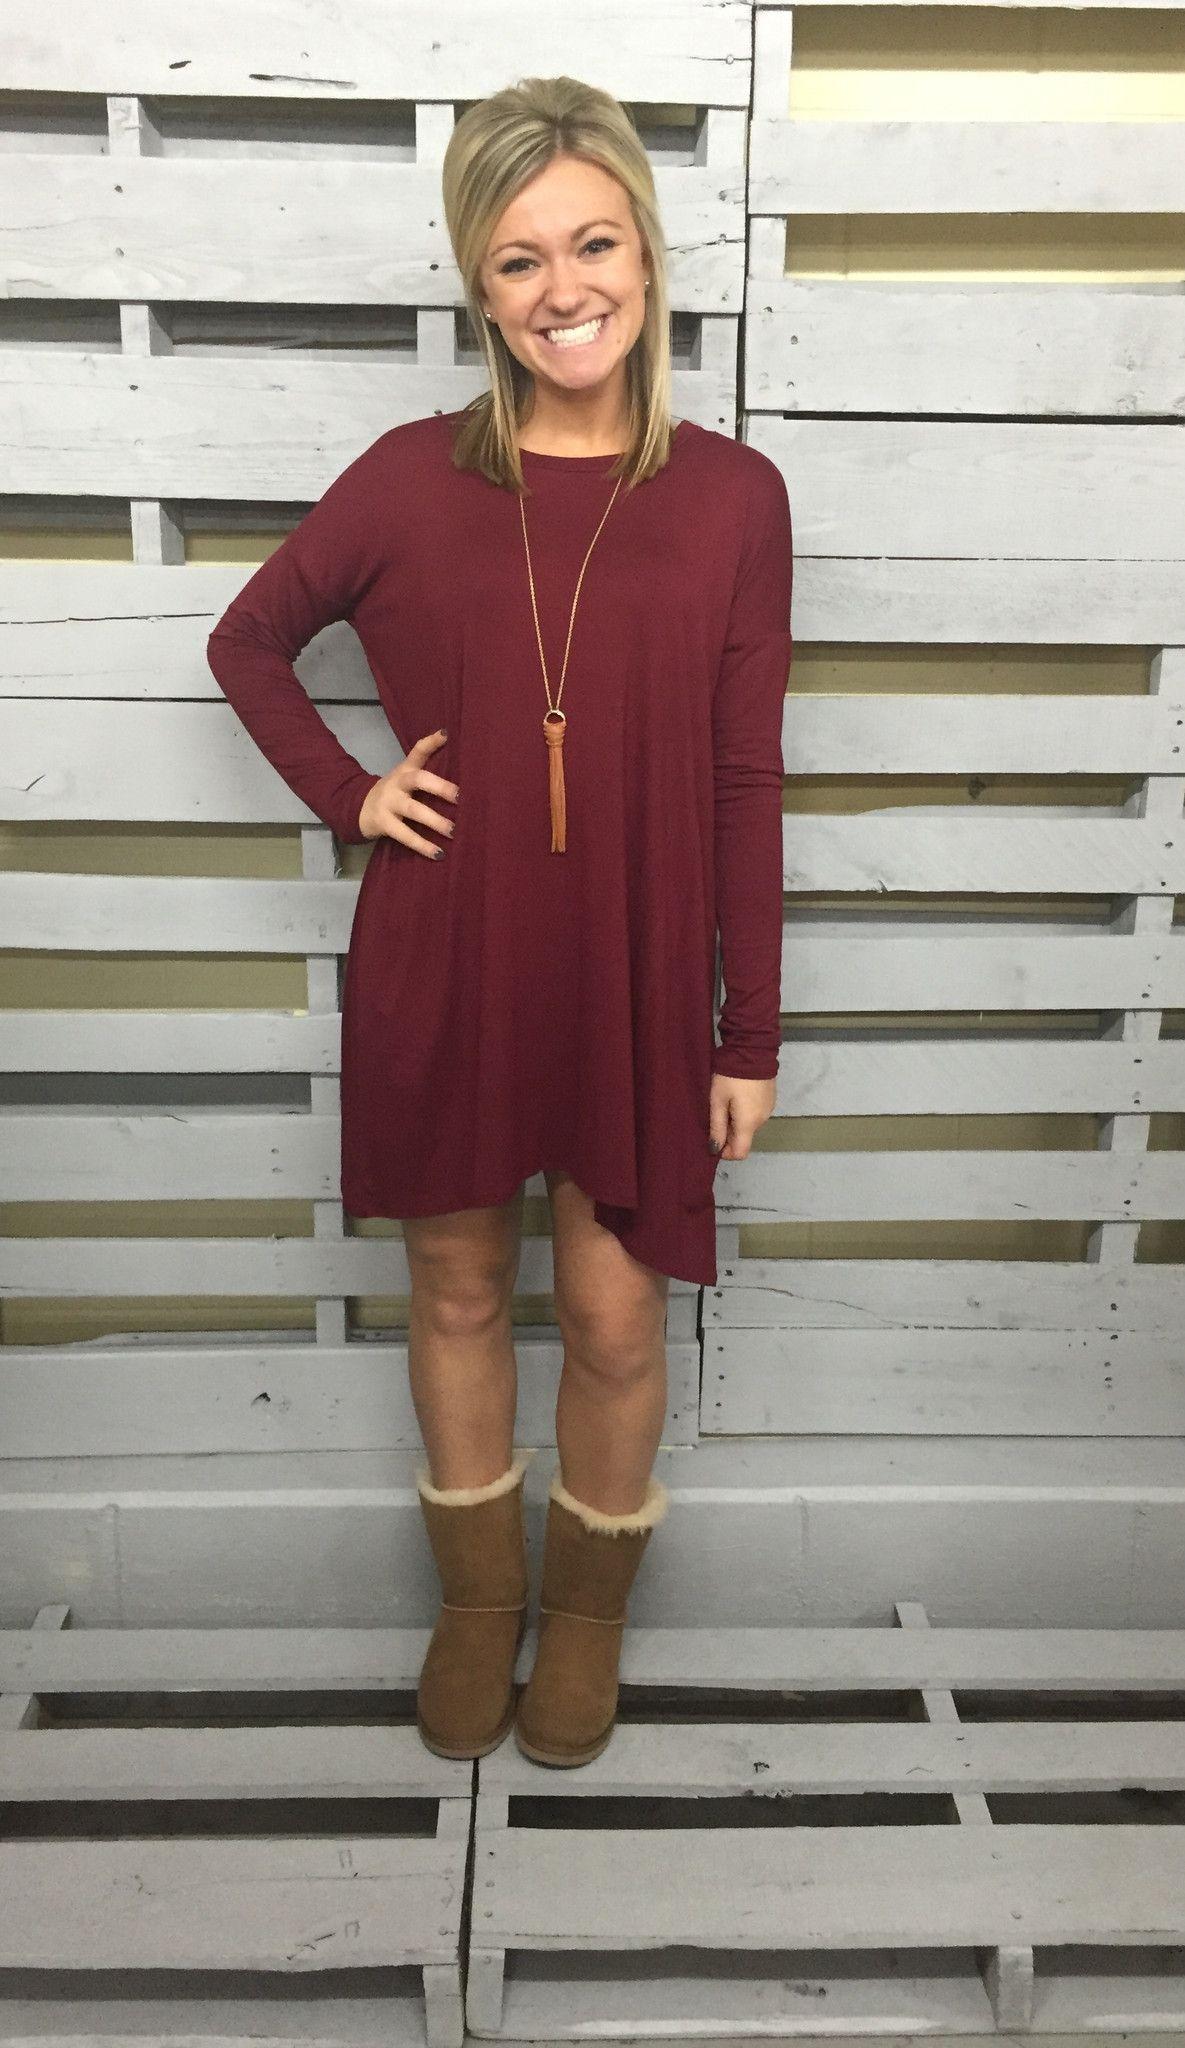 Gia T-shirt Dress | Clothes | Dresses, Fashion outfits ...